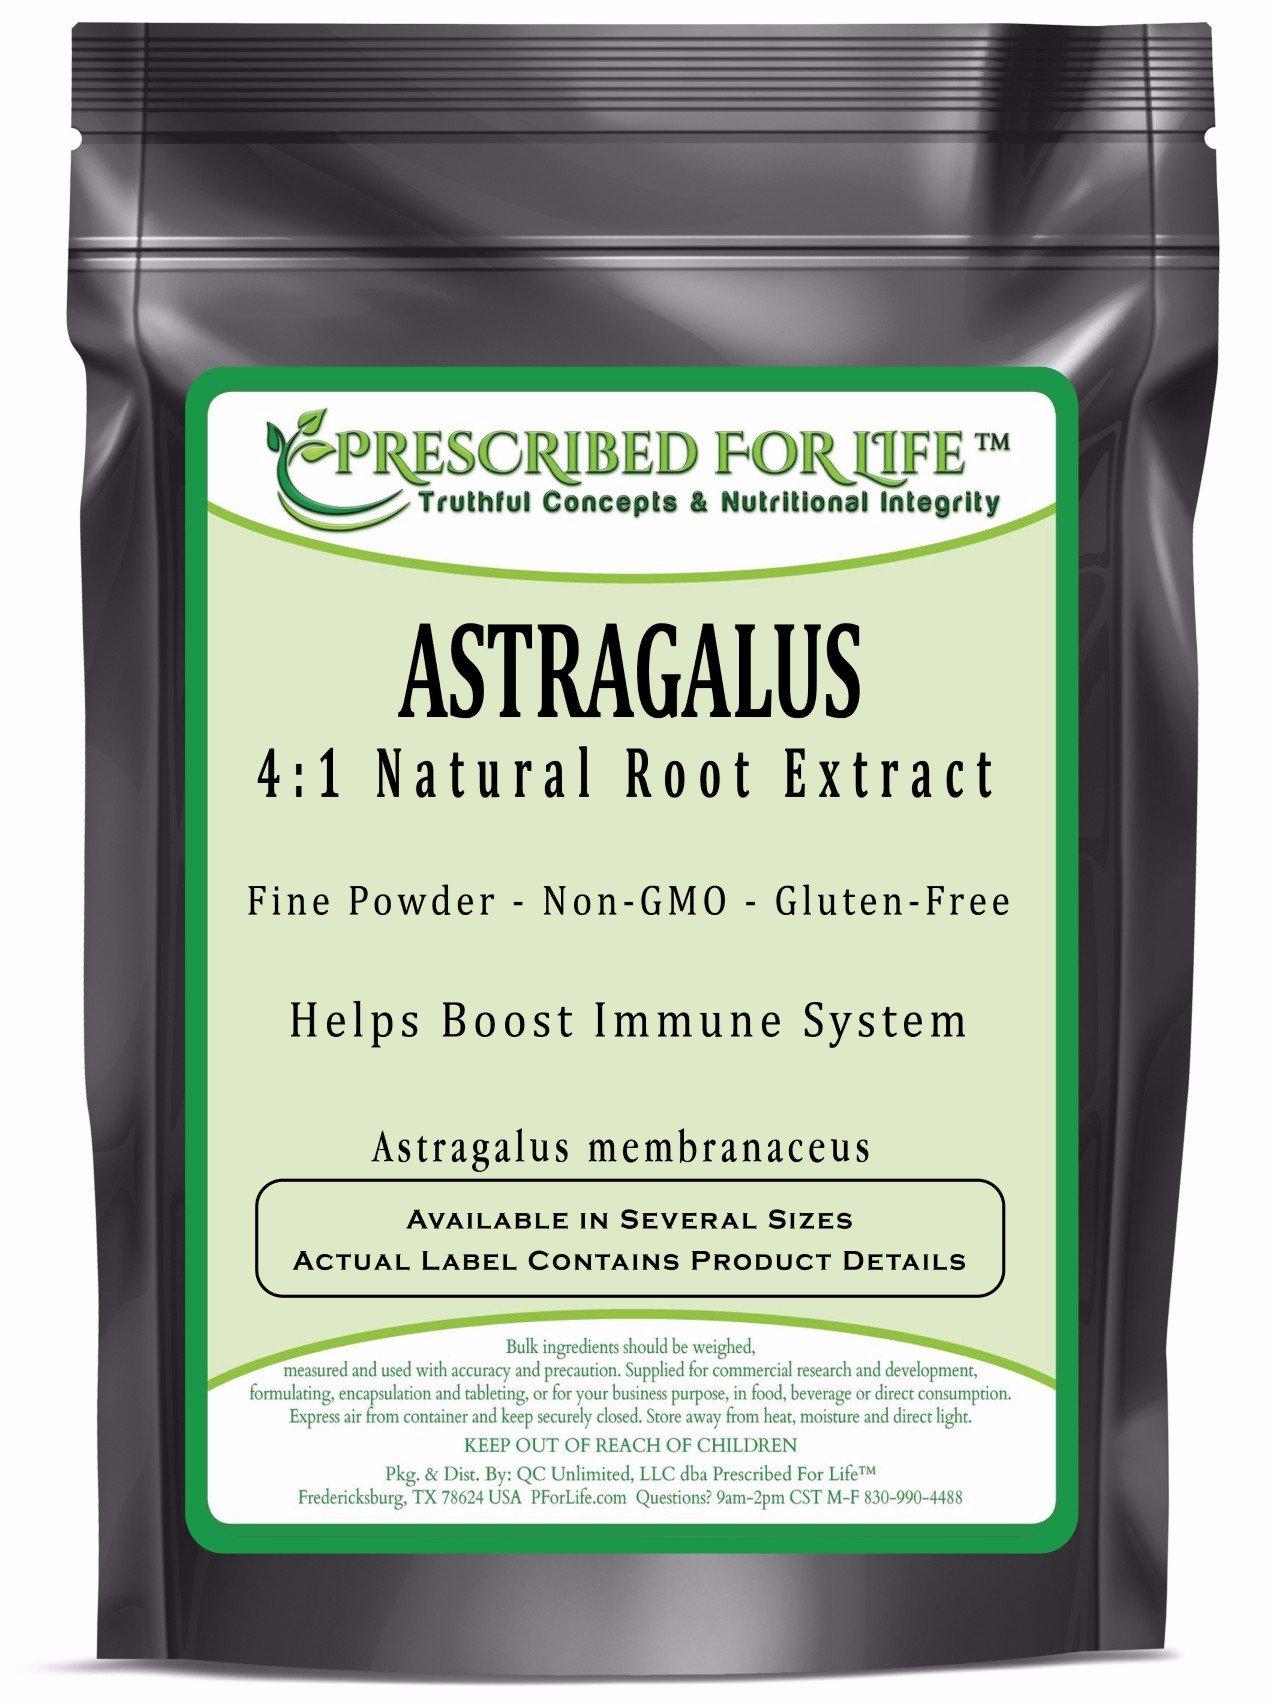 Astragalus - 4:1 Natural Root Extract Powder (Astragalus membranaceus), 55 lb